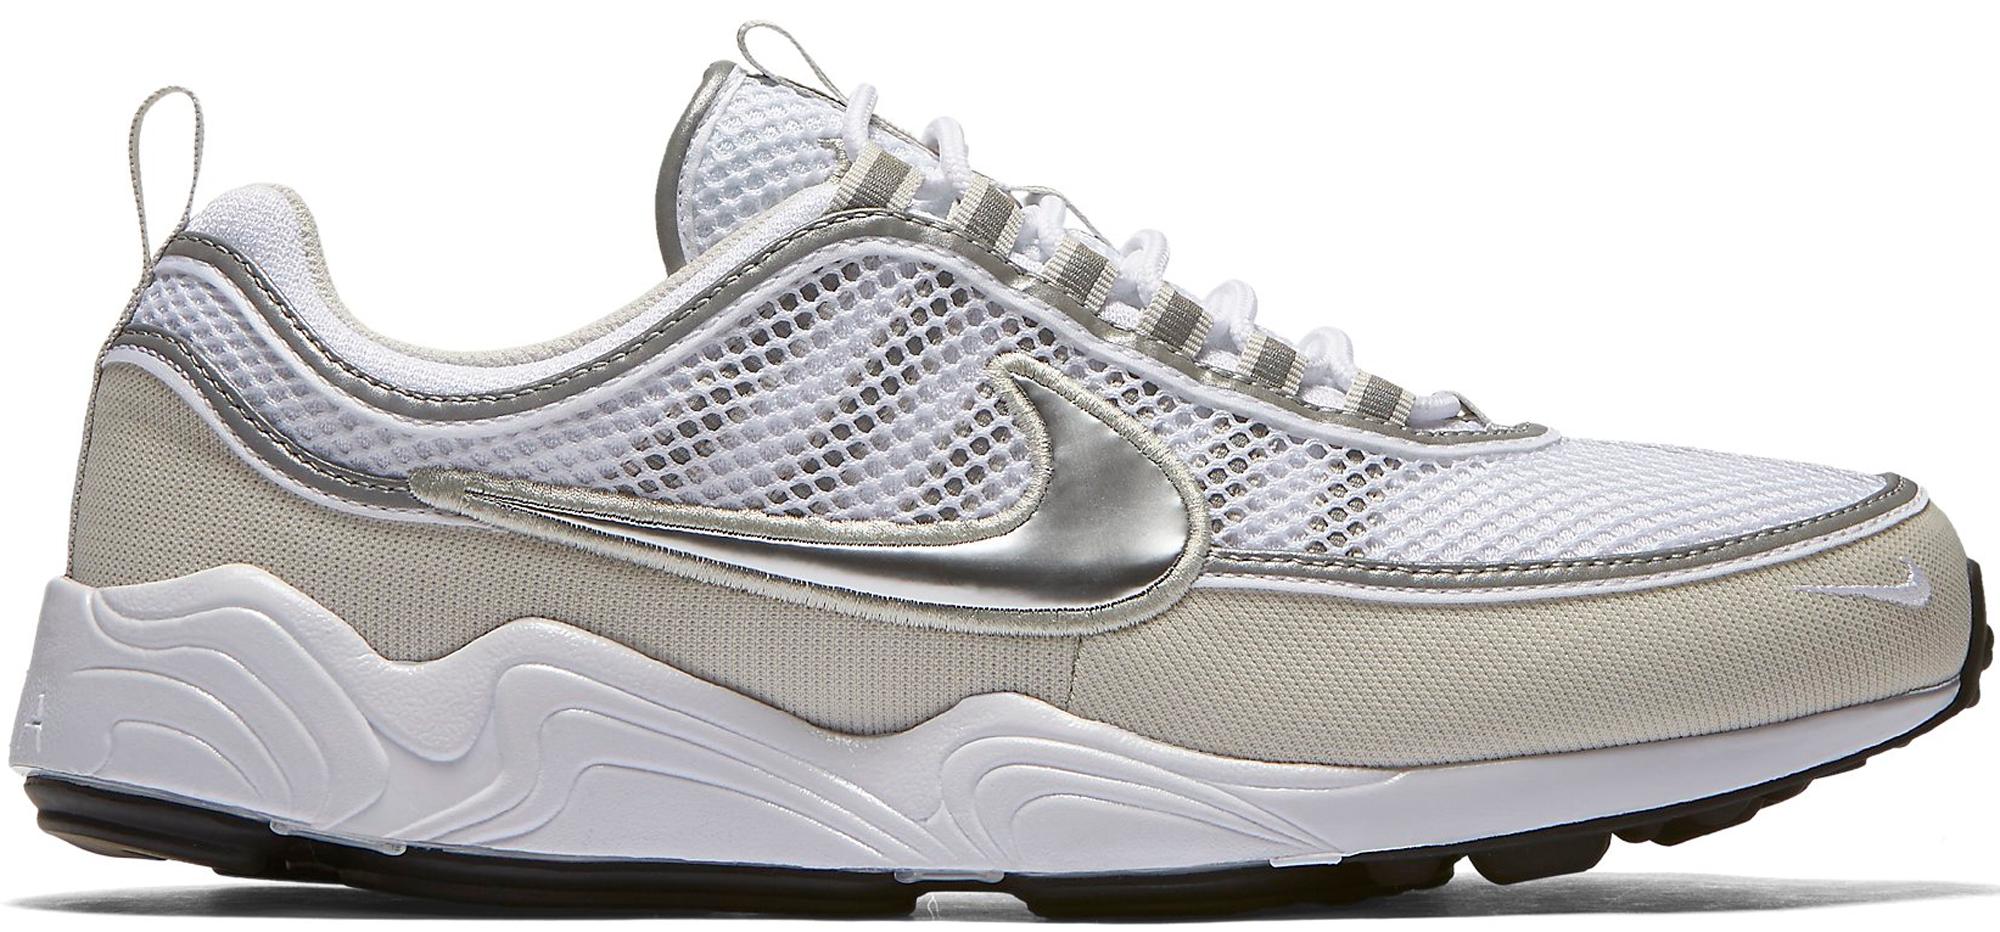 Nike Air Zoom Spiridon 16 Cream